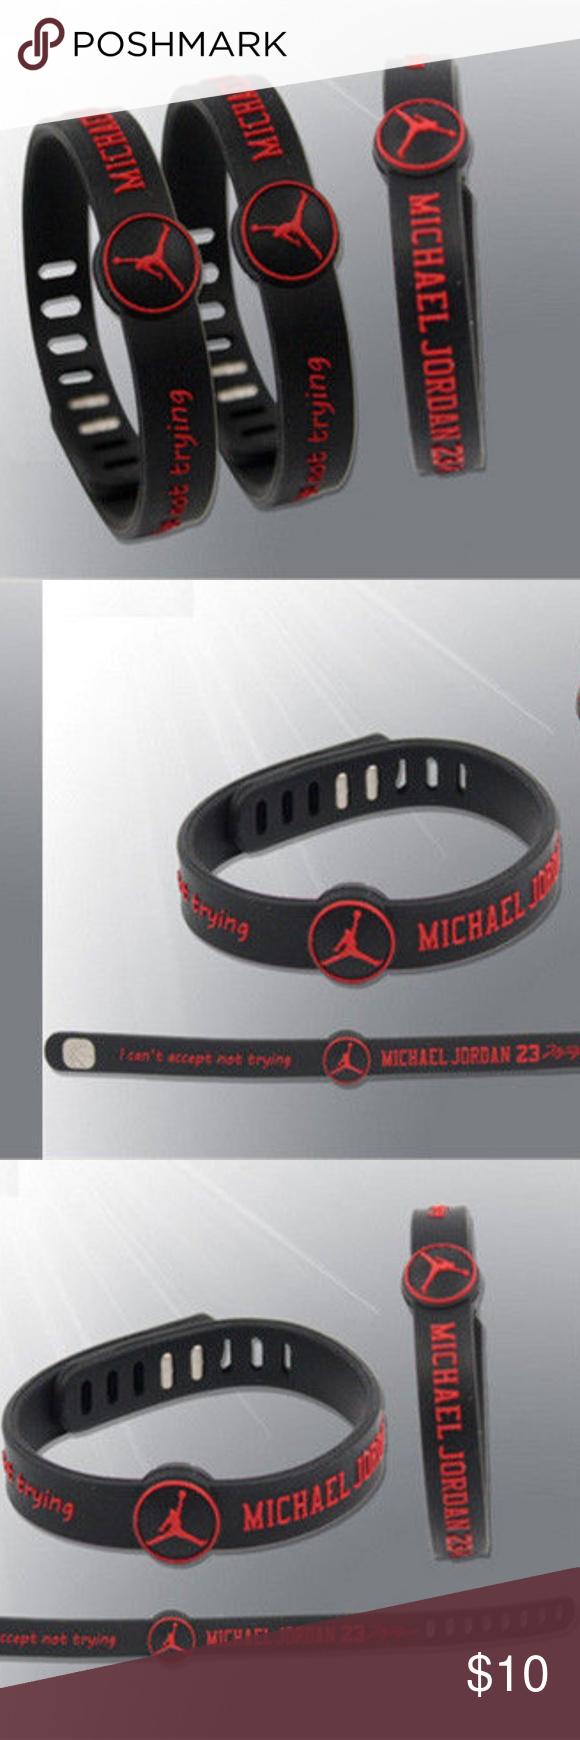 the best attitude f6227 f4e04 Michael Jordan Silicone Wristband Bracelet Michael Jordan Silicone Wristband  Says